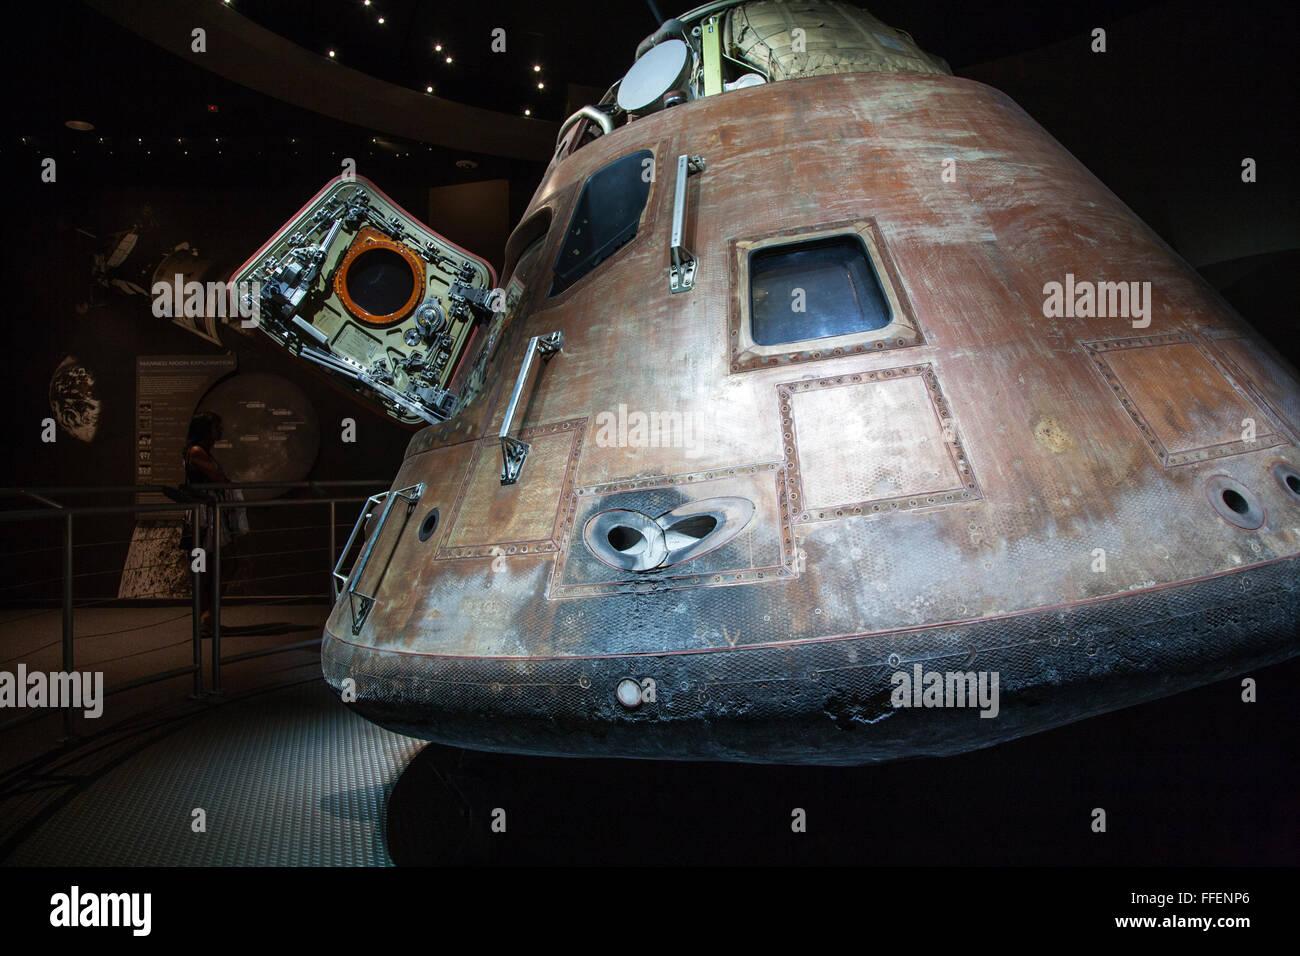 Apollo 14 Re-Entry Kapsel auf dem Display am Kennedy Space Center, Florida, USA Stockbild